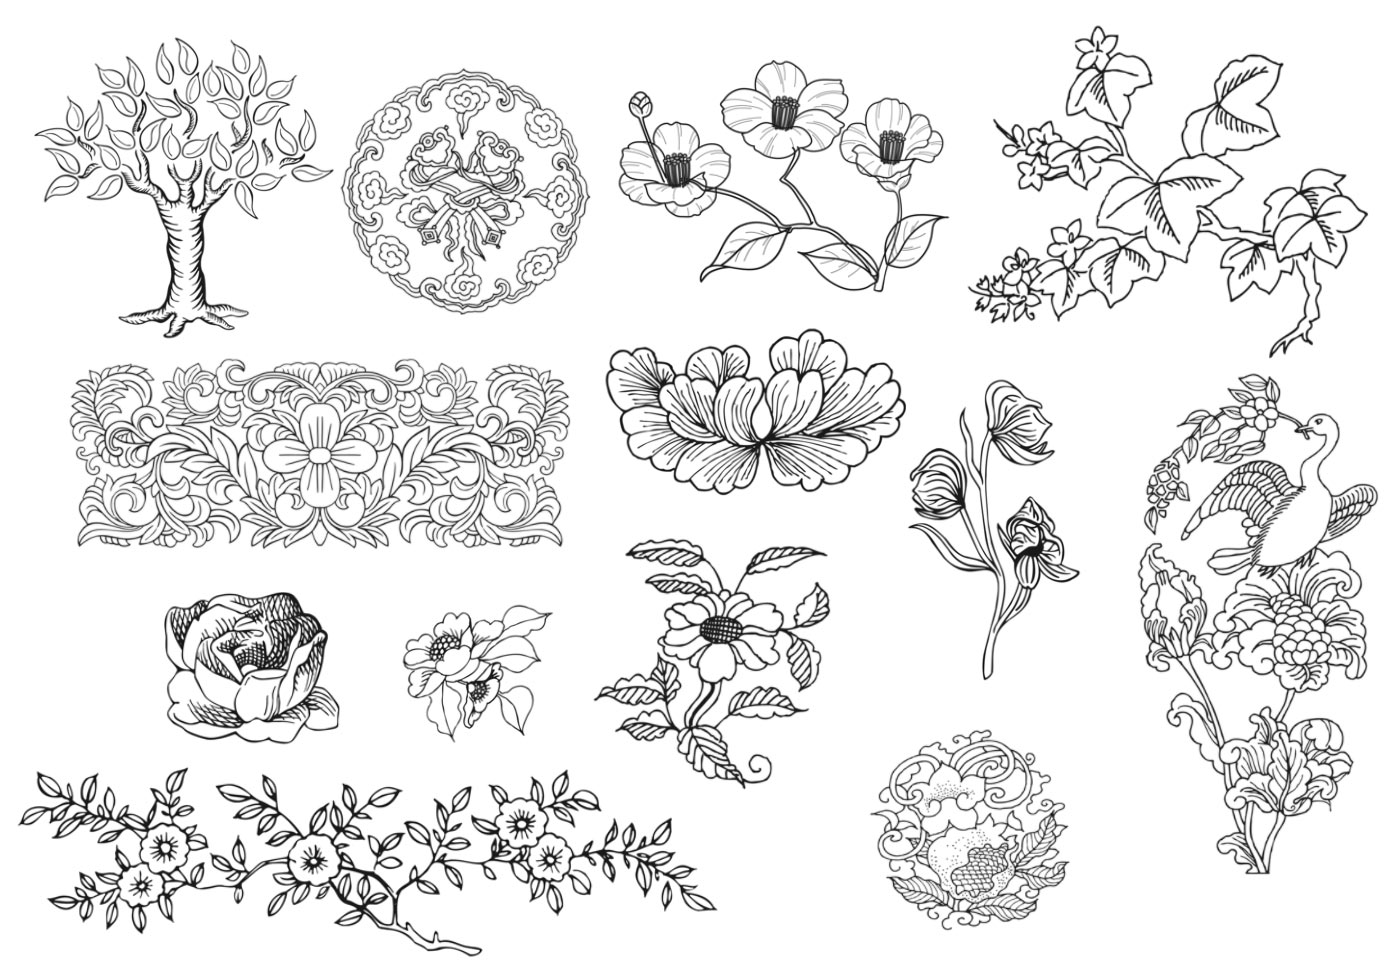 Dekorative Ornamente Sammlung